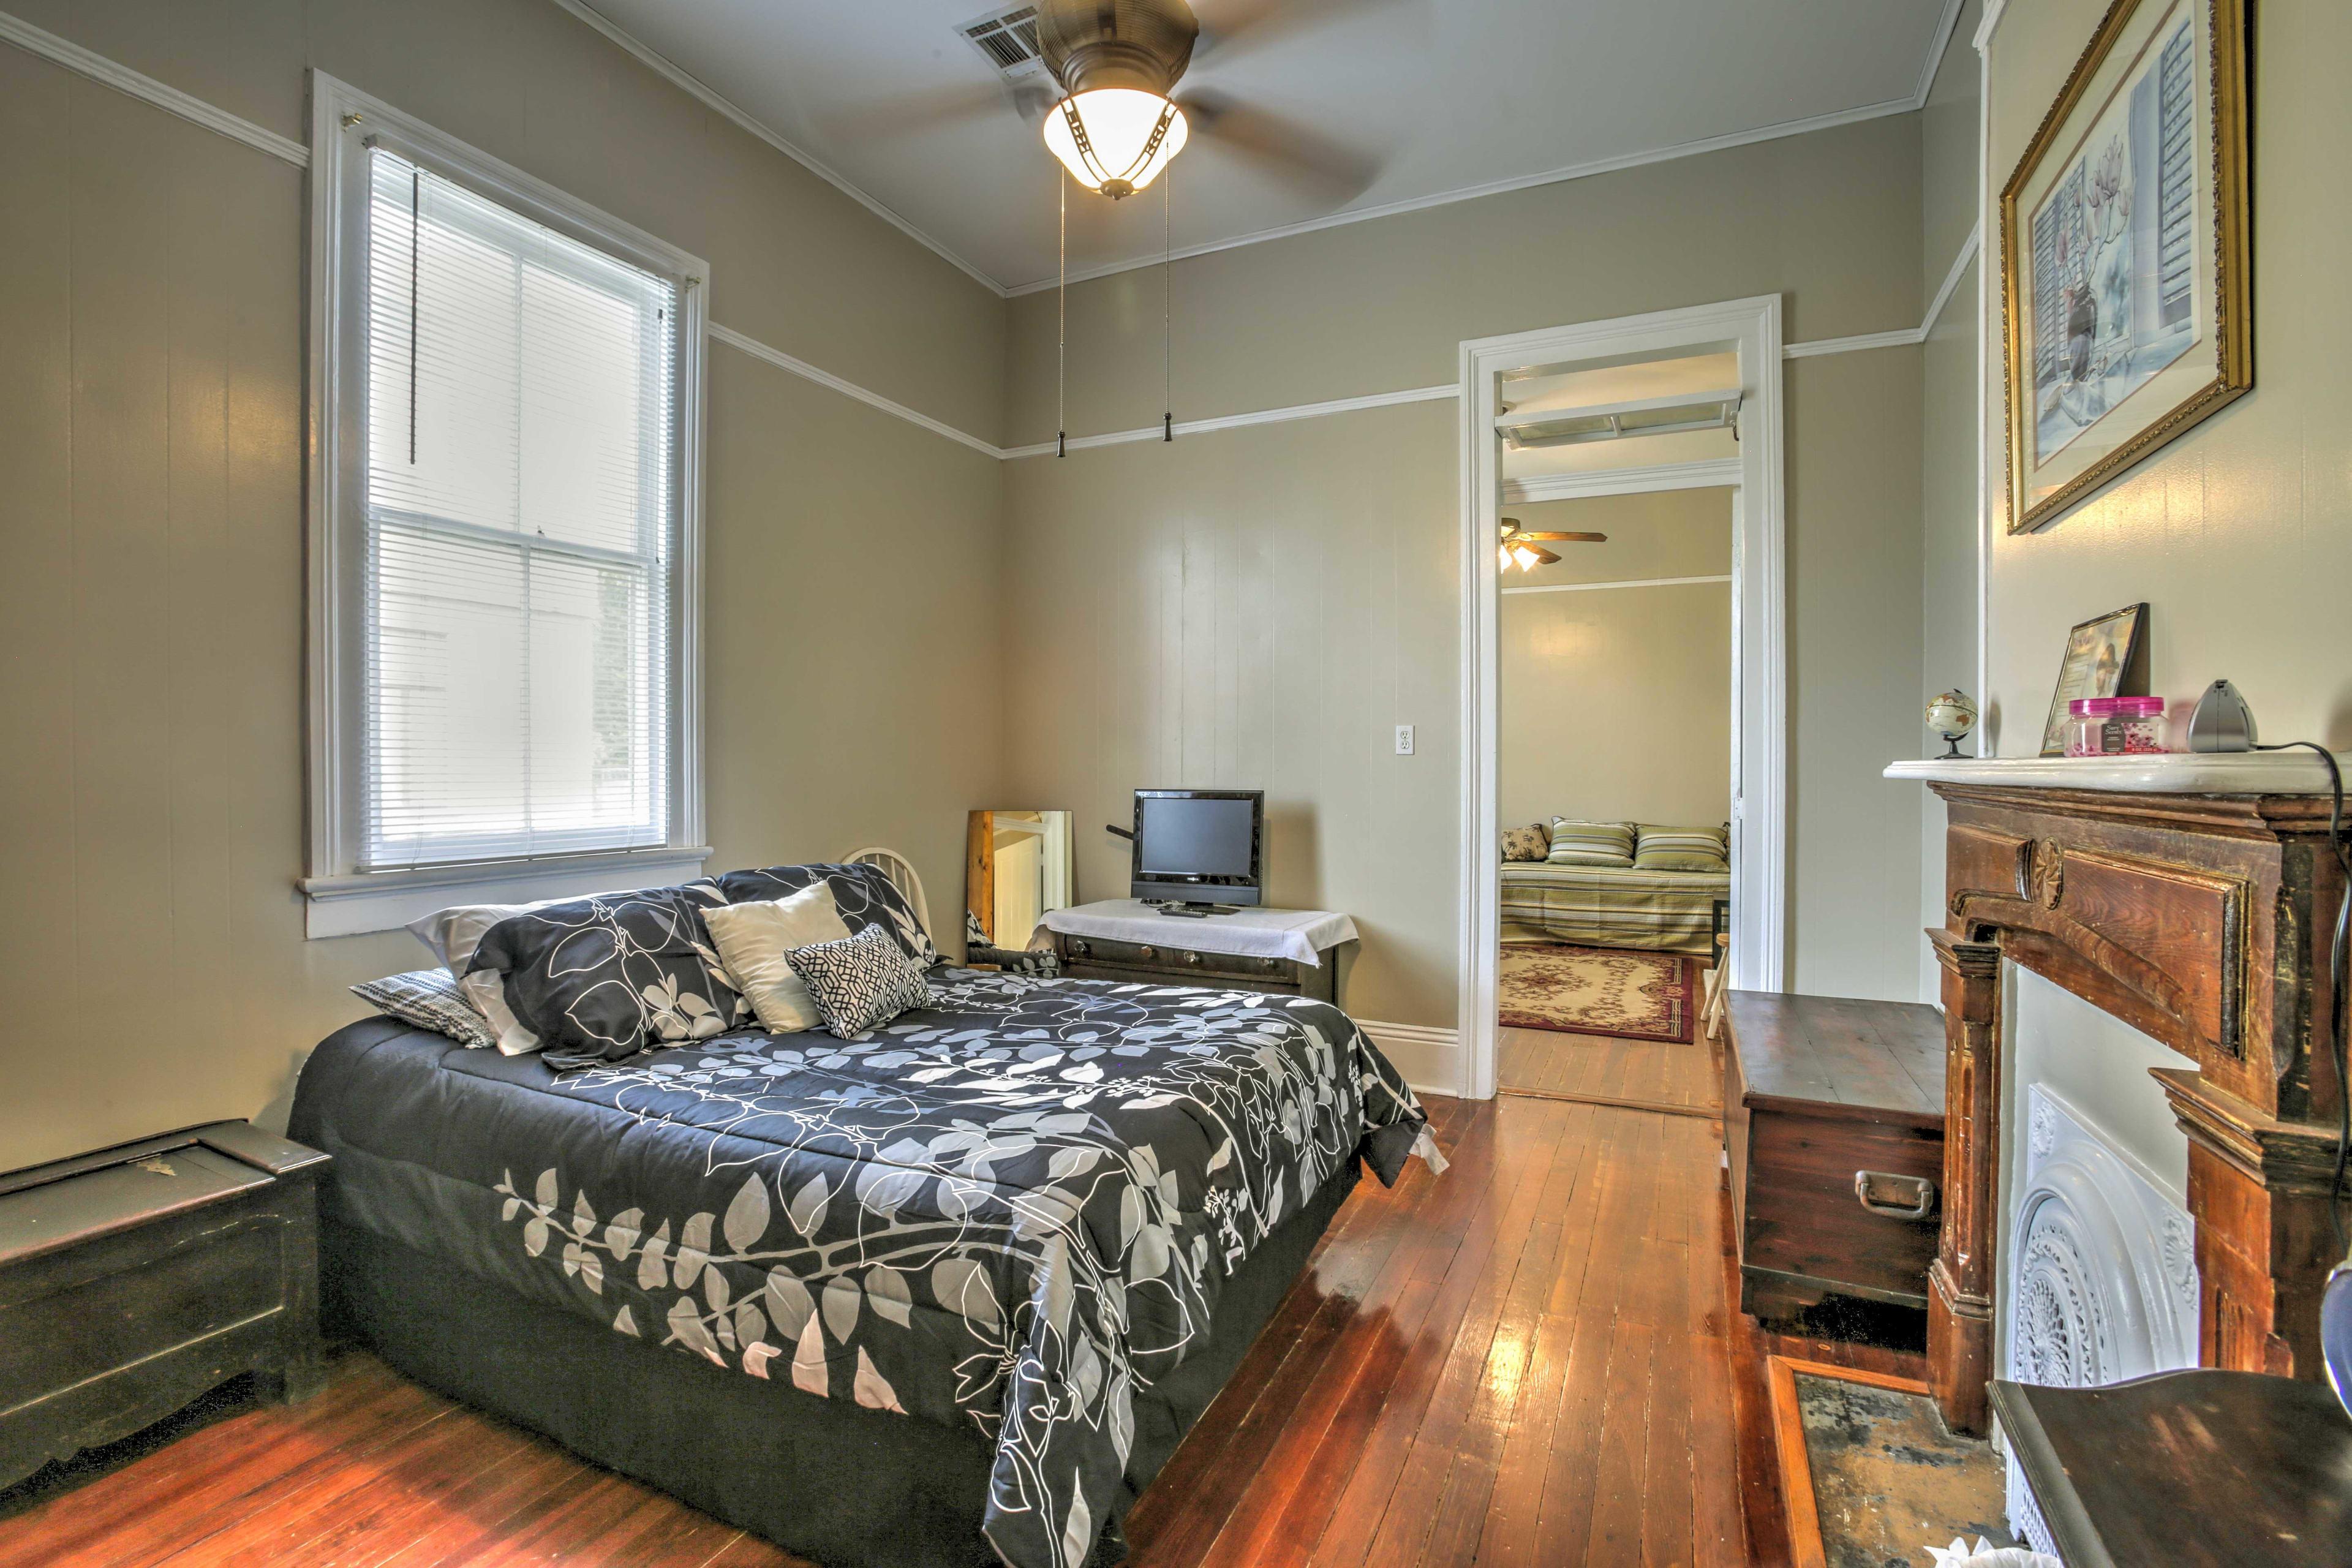 Curl up under the cozy comforter for restful slumbers.